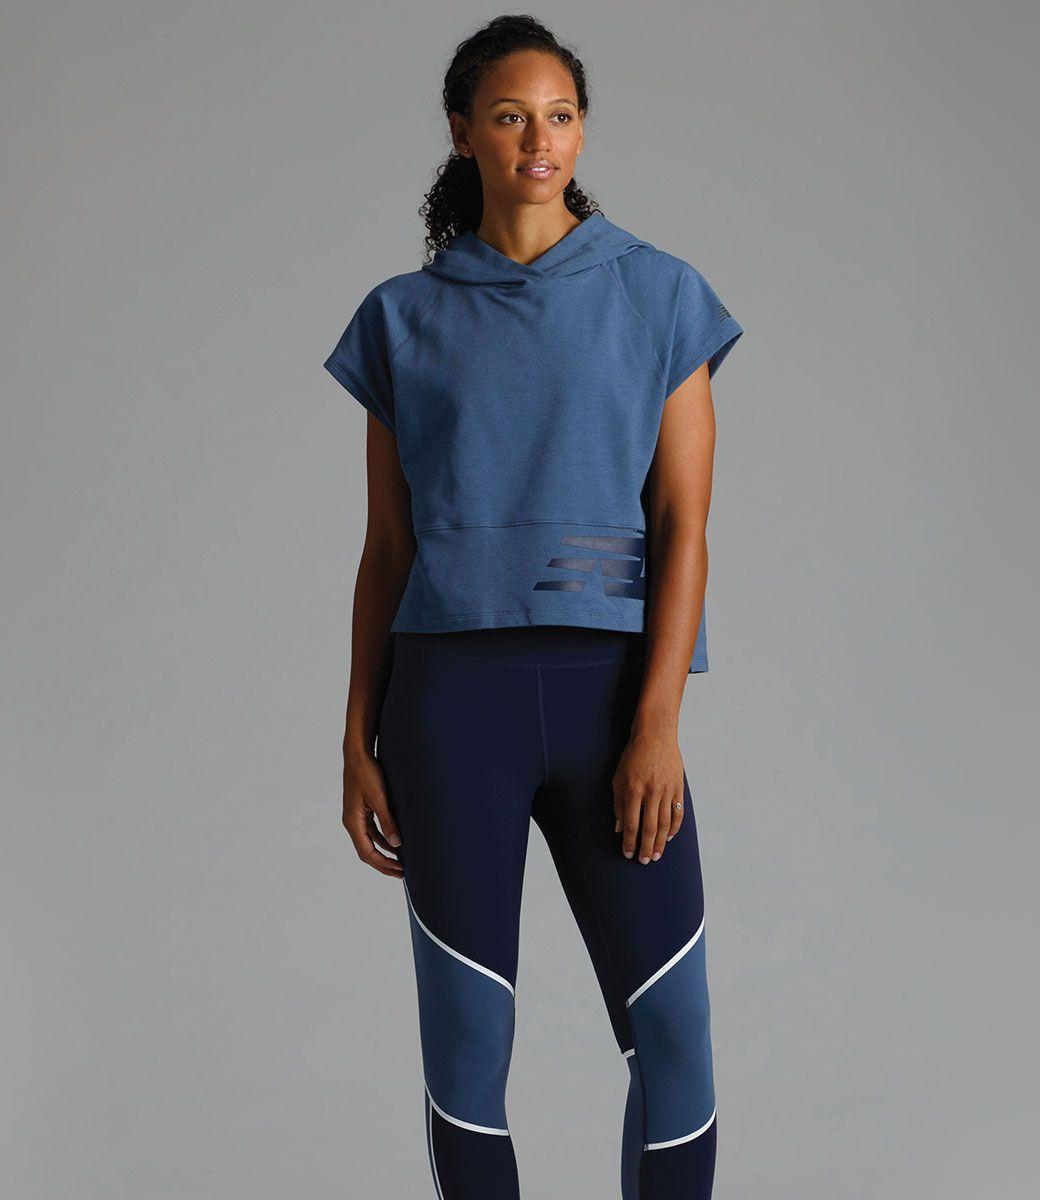 New Balance Womens Performance KL1 Q317,